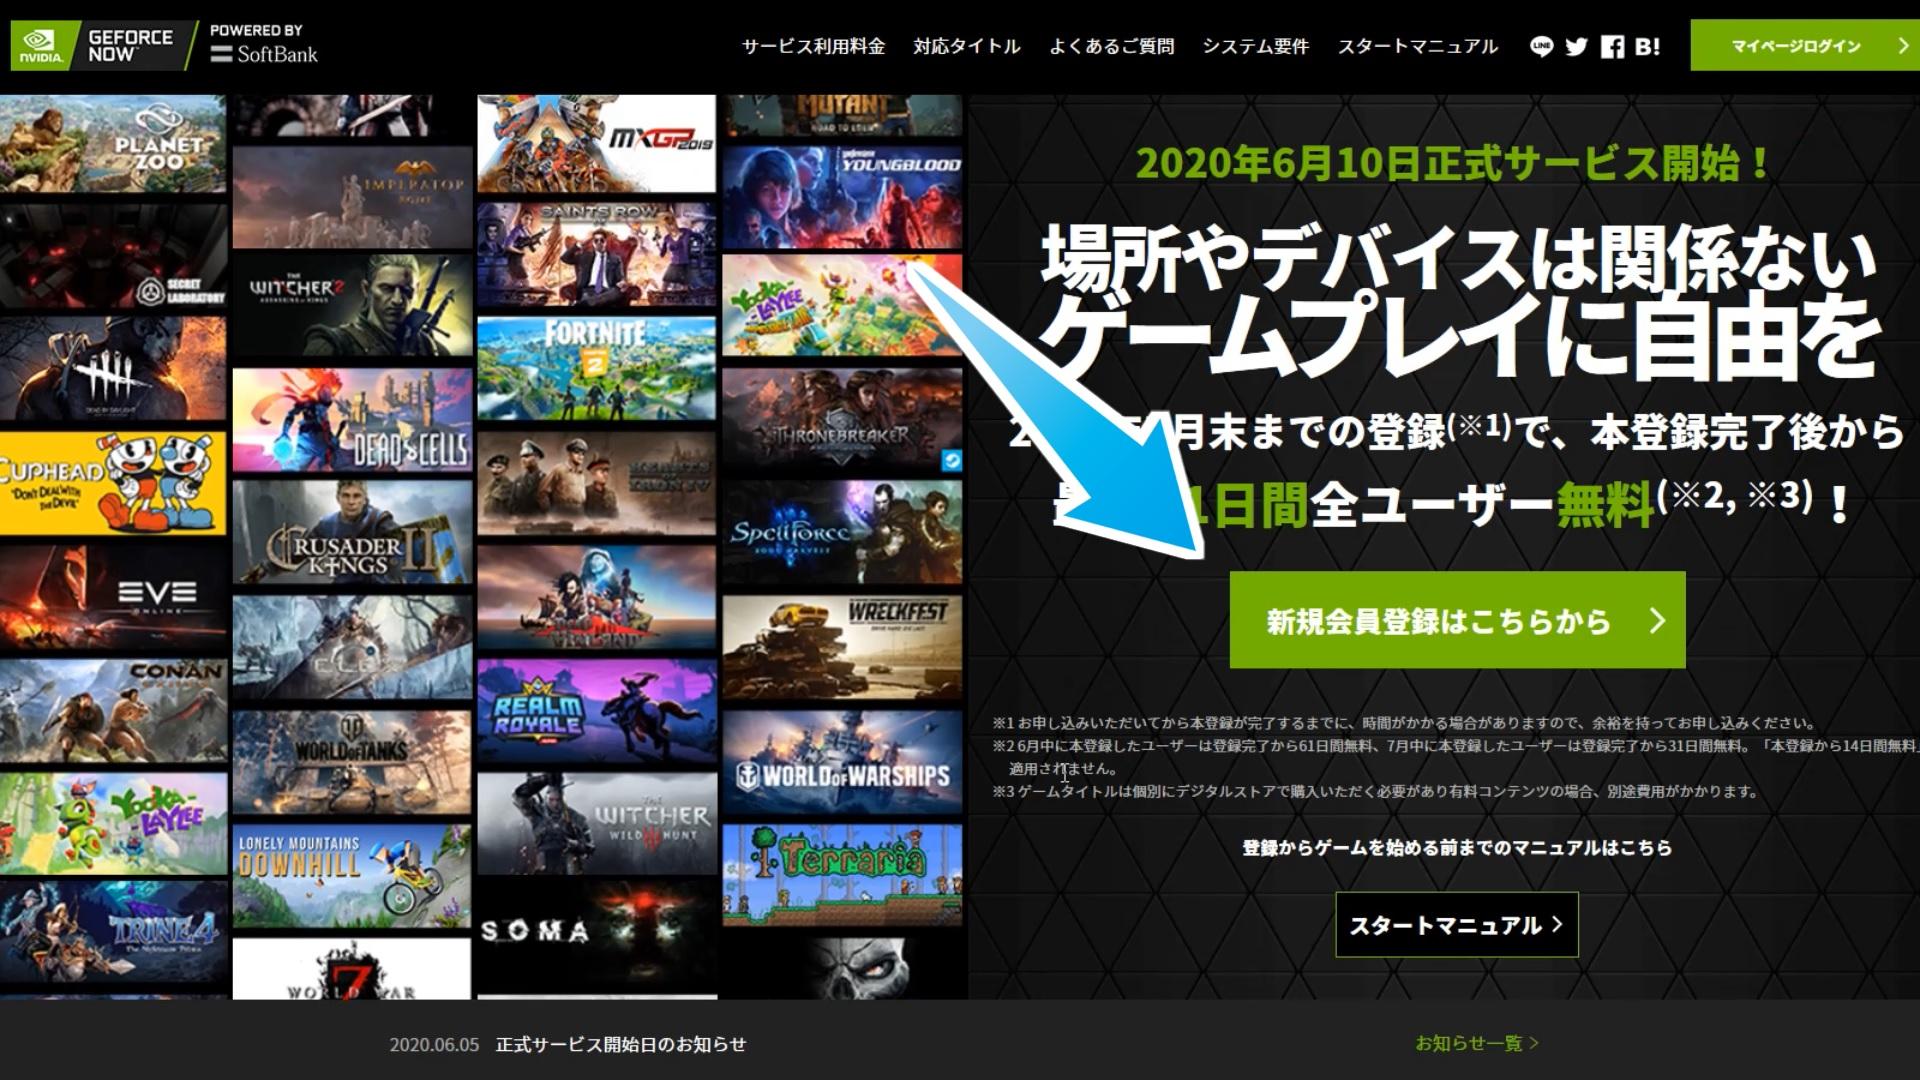 GeForce NowのHPから「新規会員登録はこちらから」をクリック。